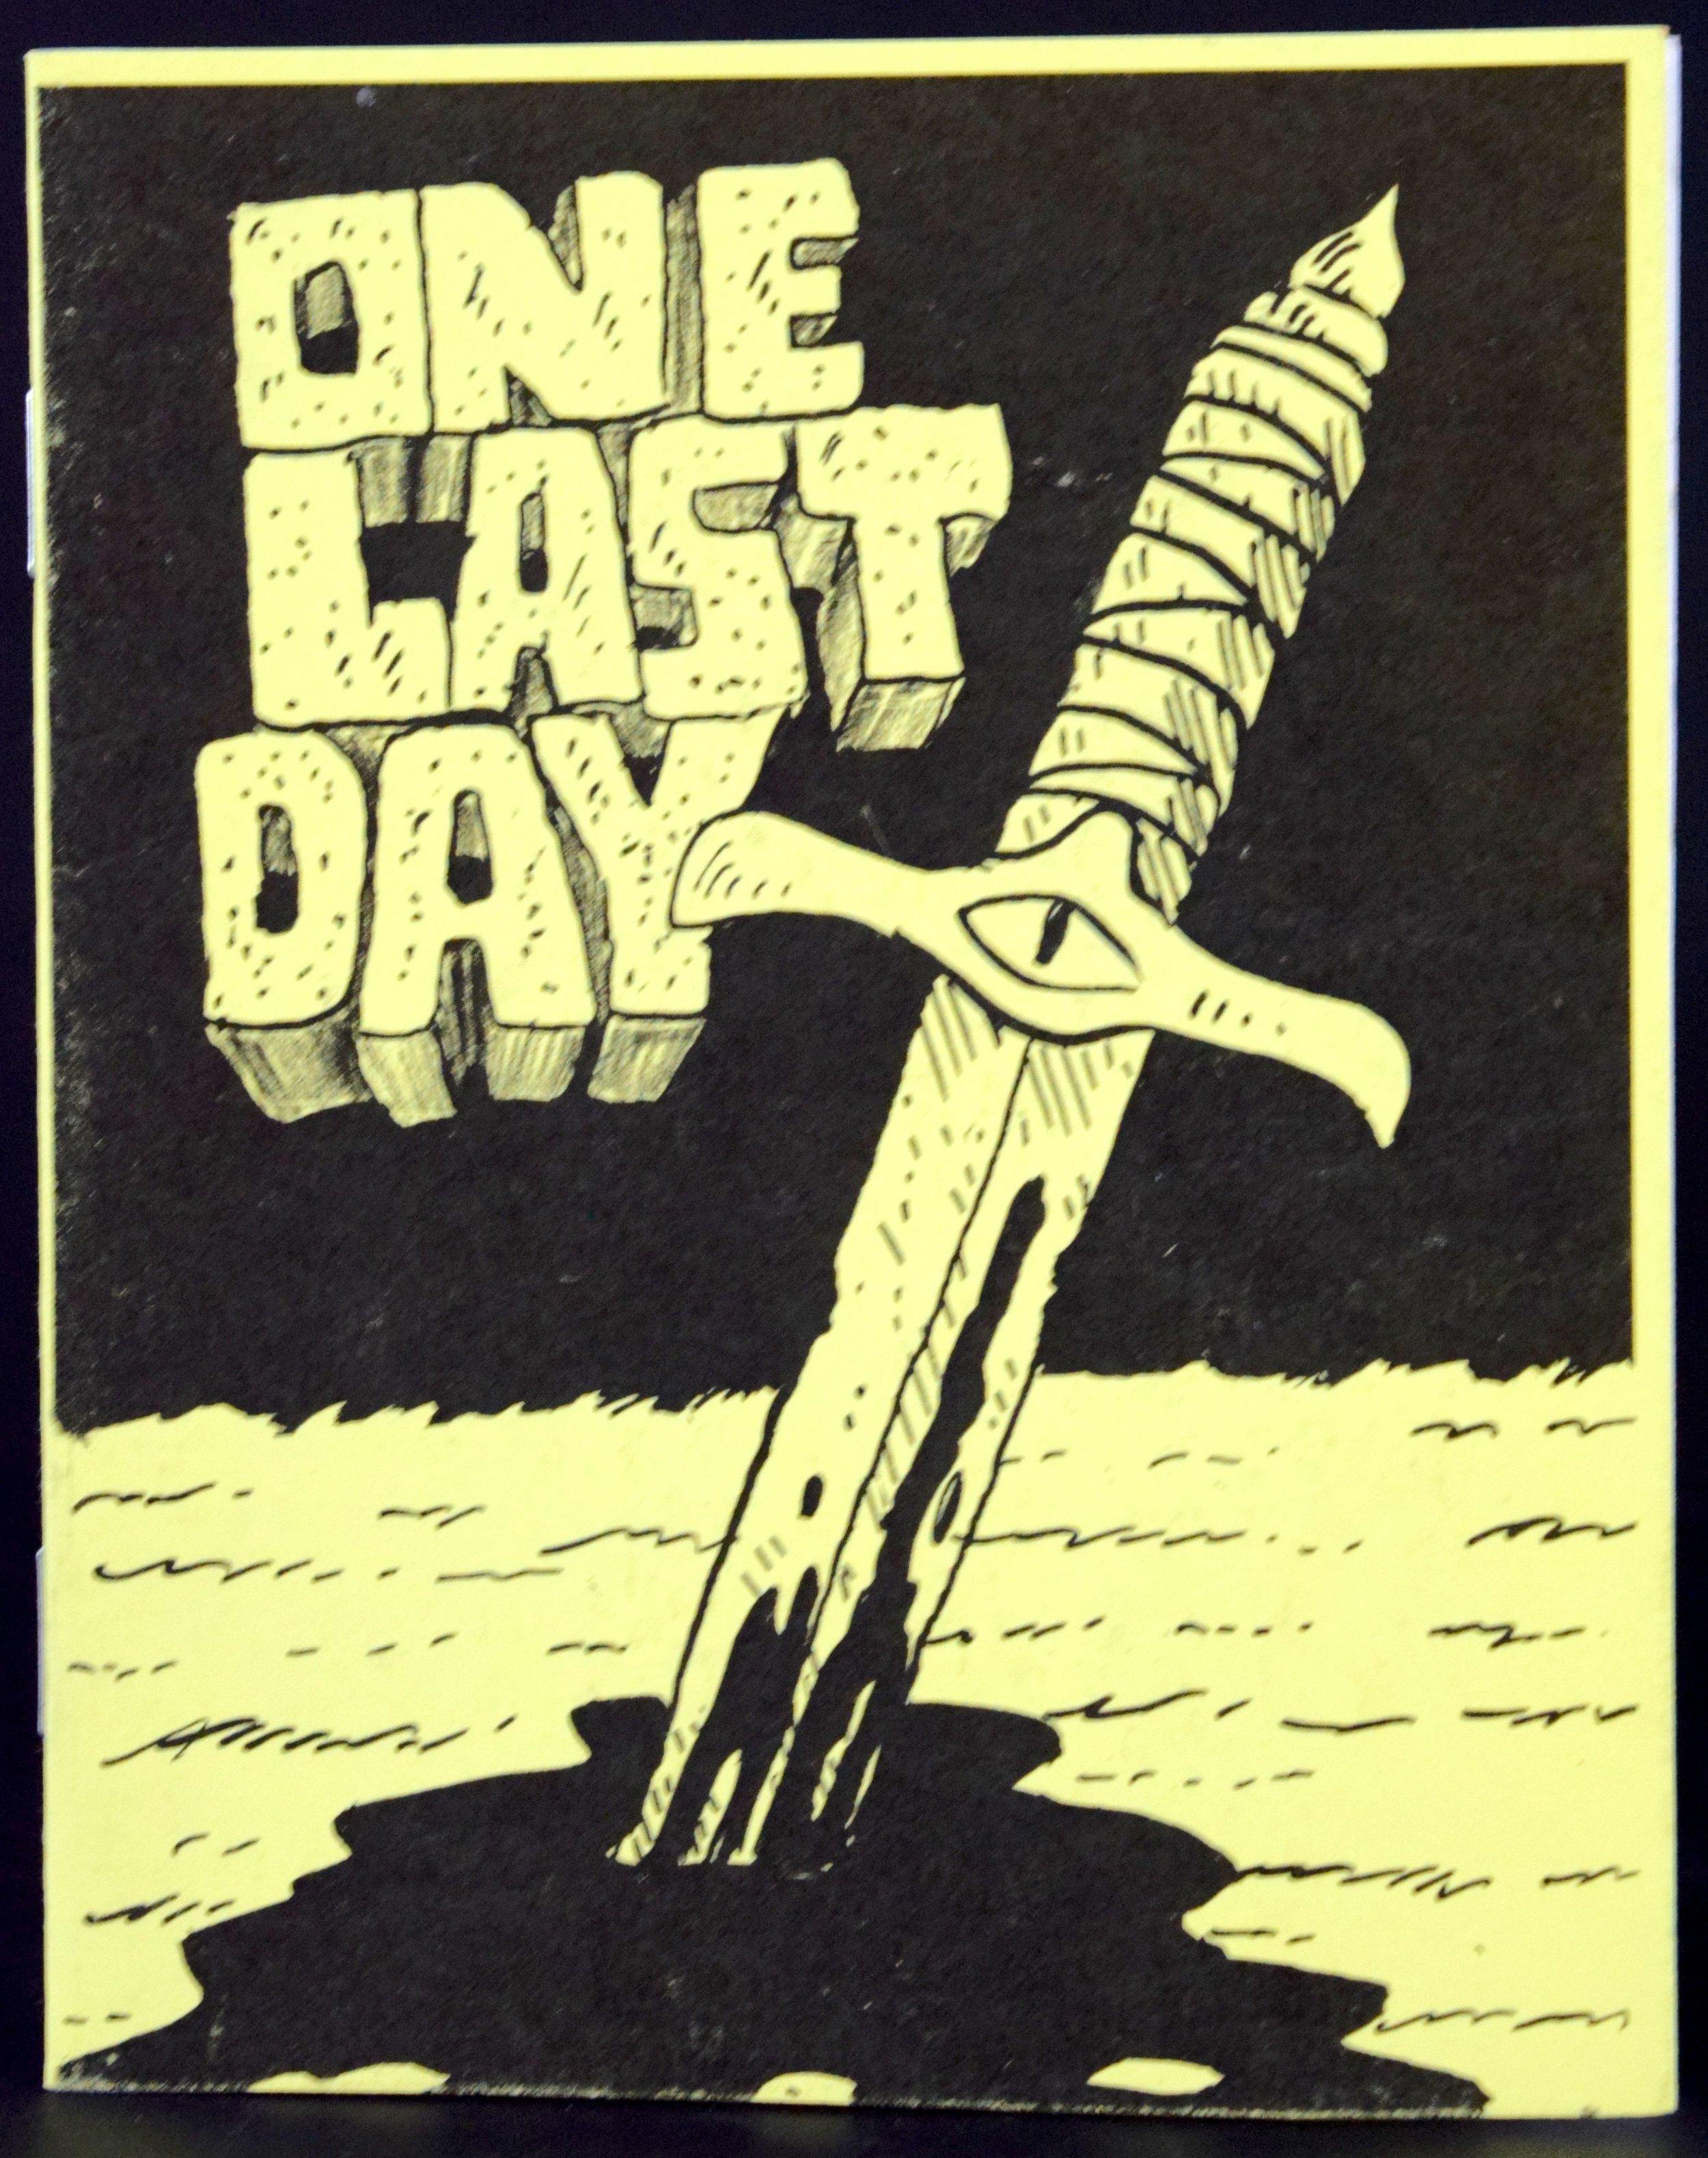 One Last Day Mini-Comic by  Adam Yeater .